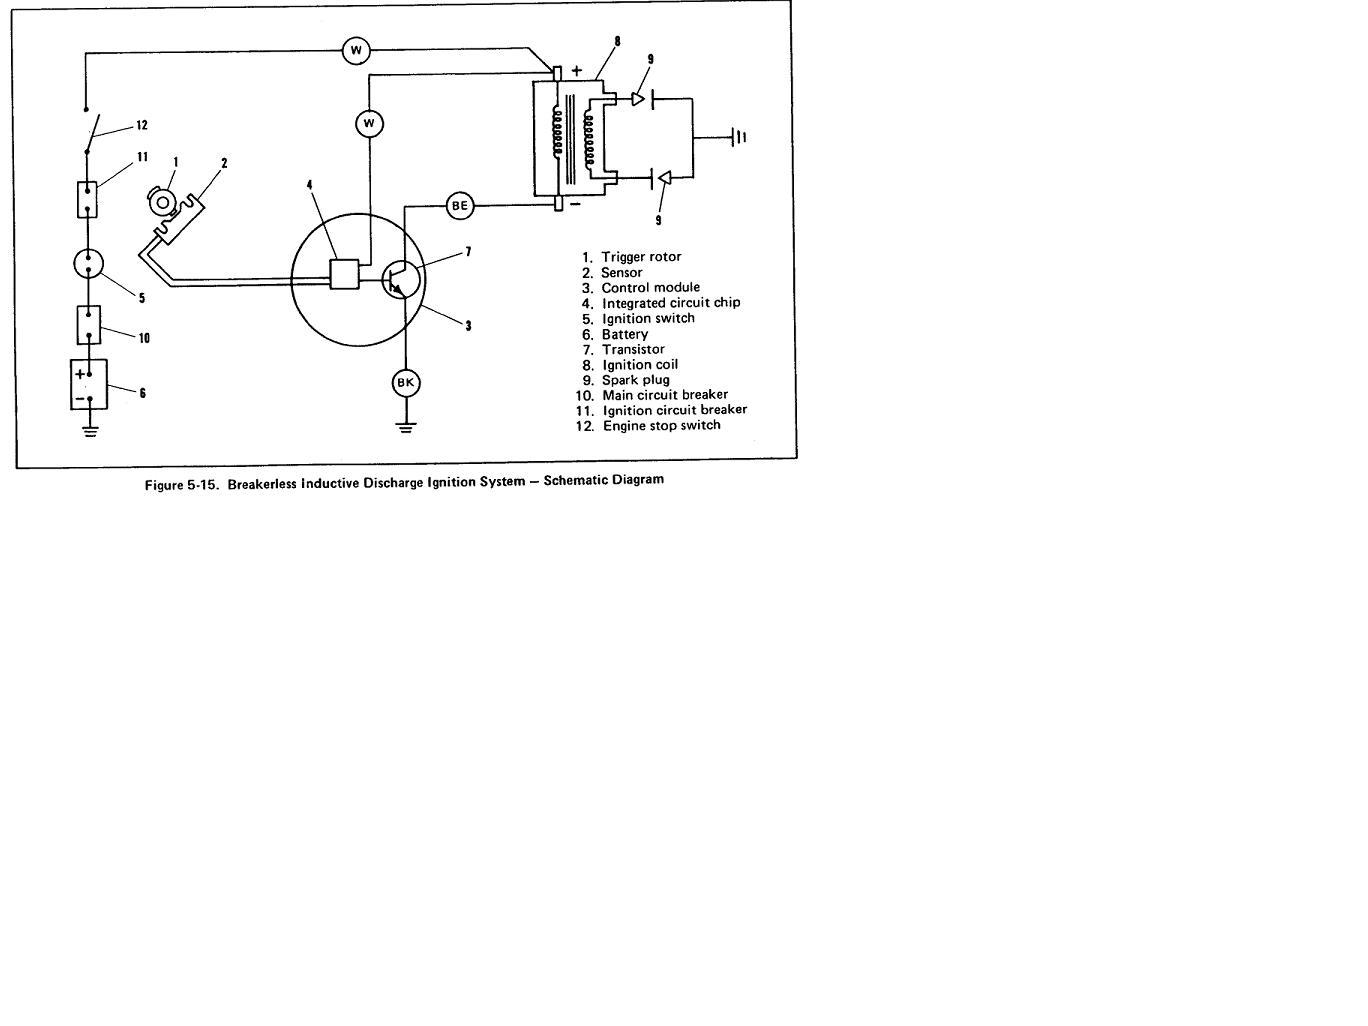 harley davidson dyna ignition wiring diagram sg 4579  wiring diagram also kawasaki wiring diagrams on dyna  sg 4579  wiring diagram also kawasaki